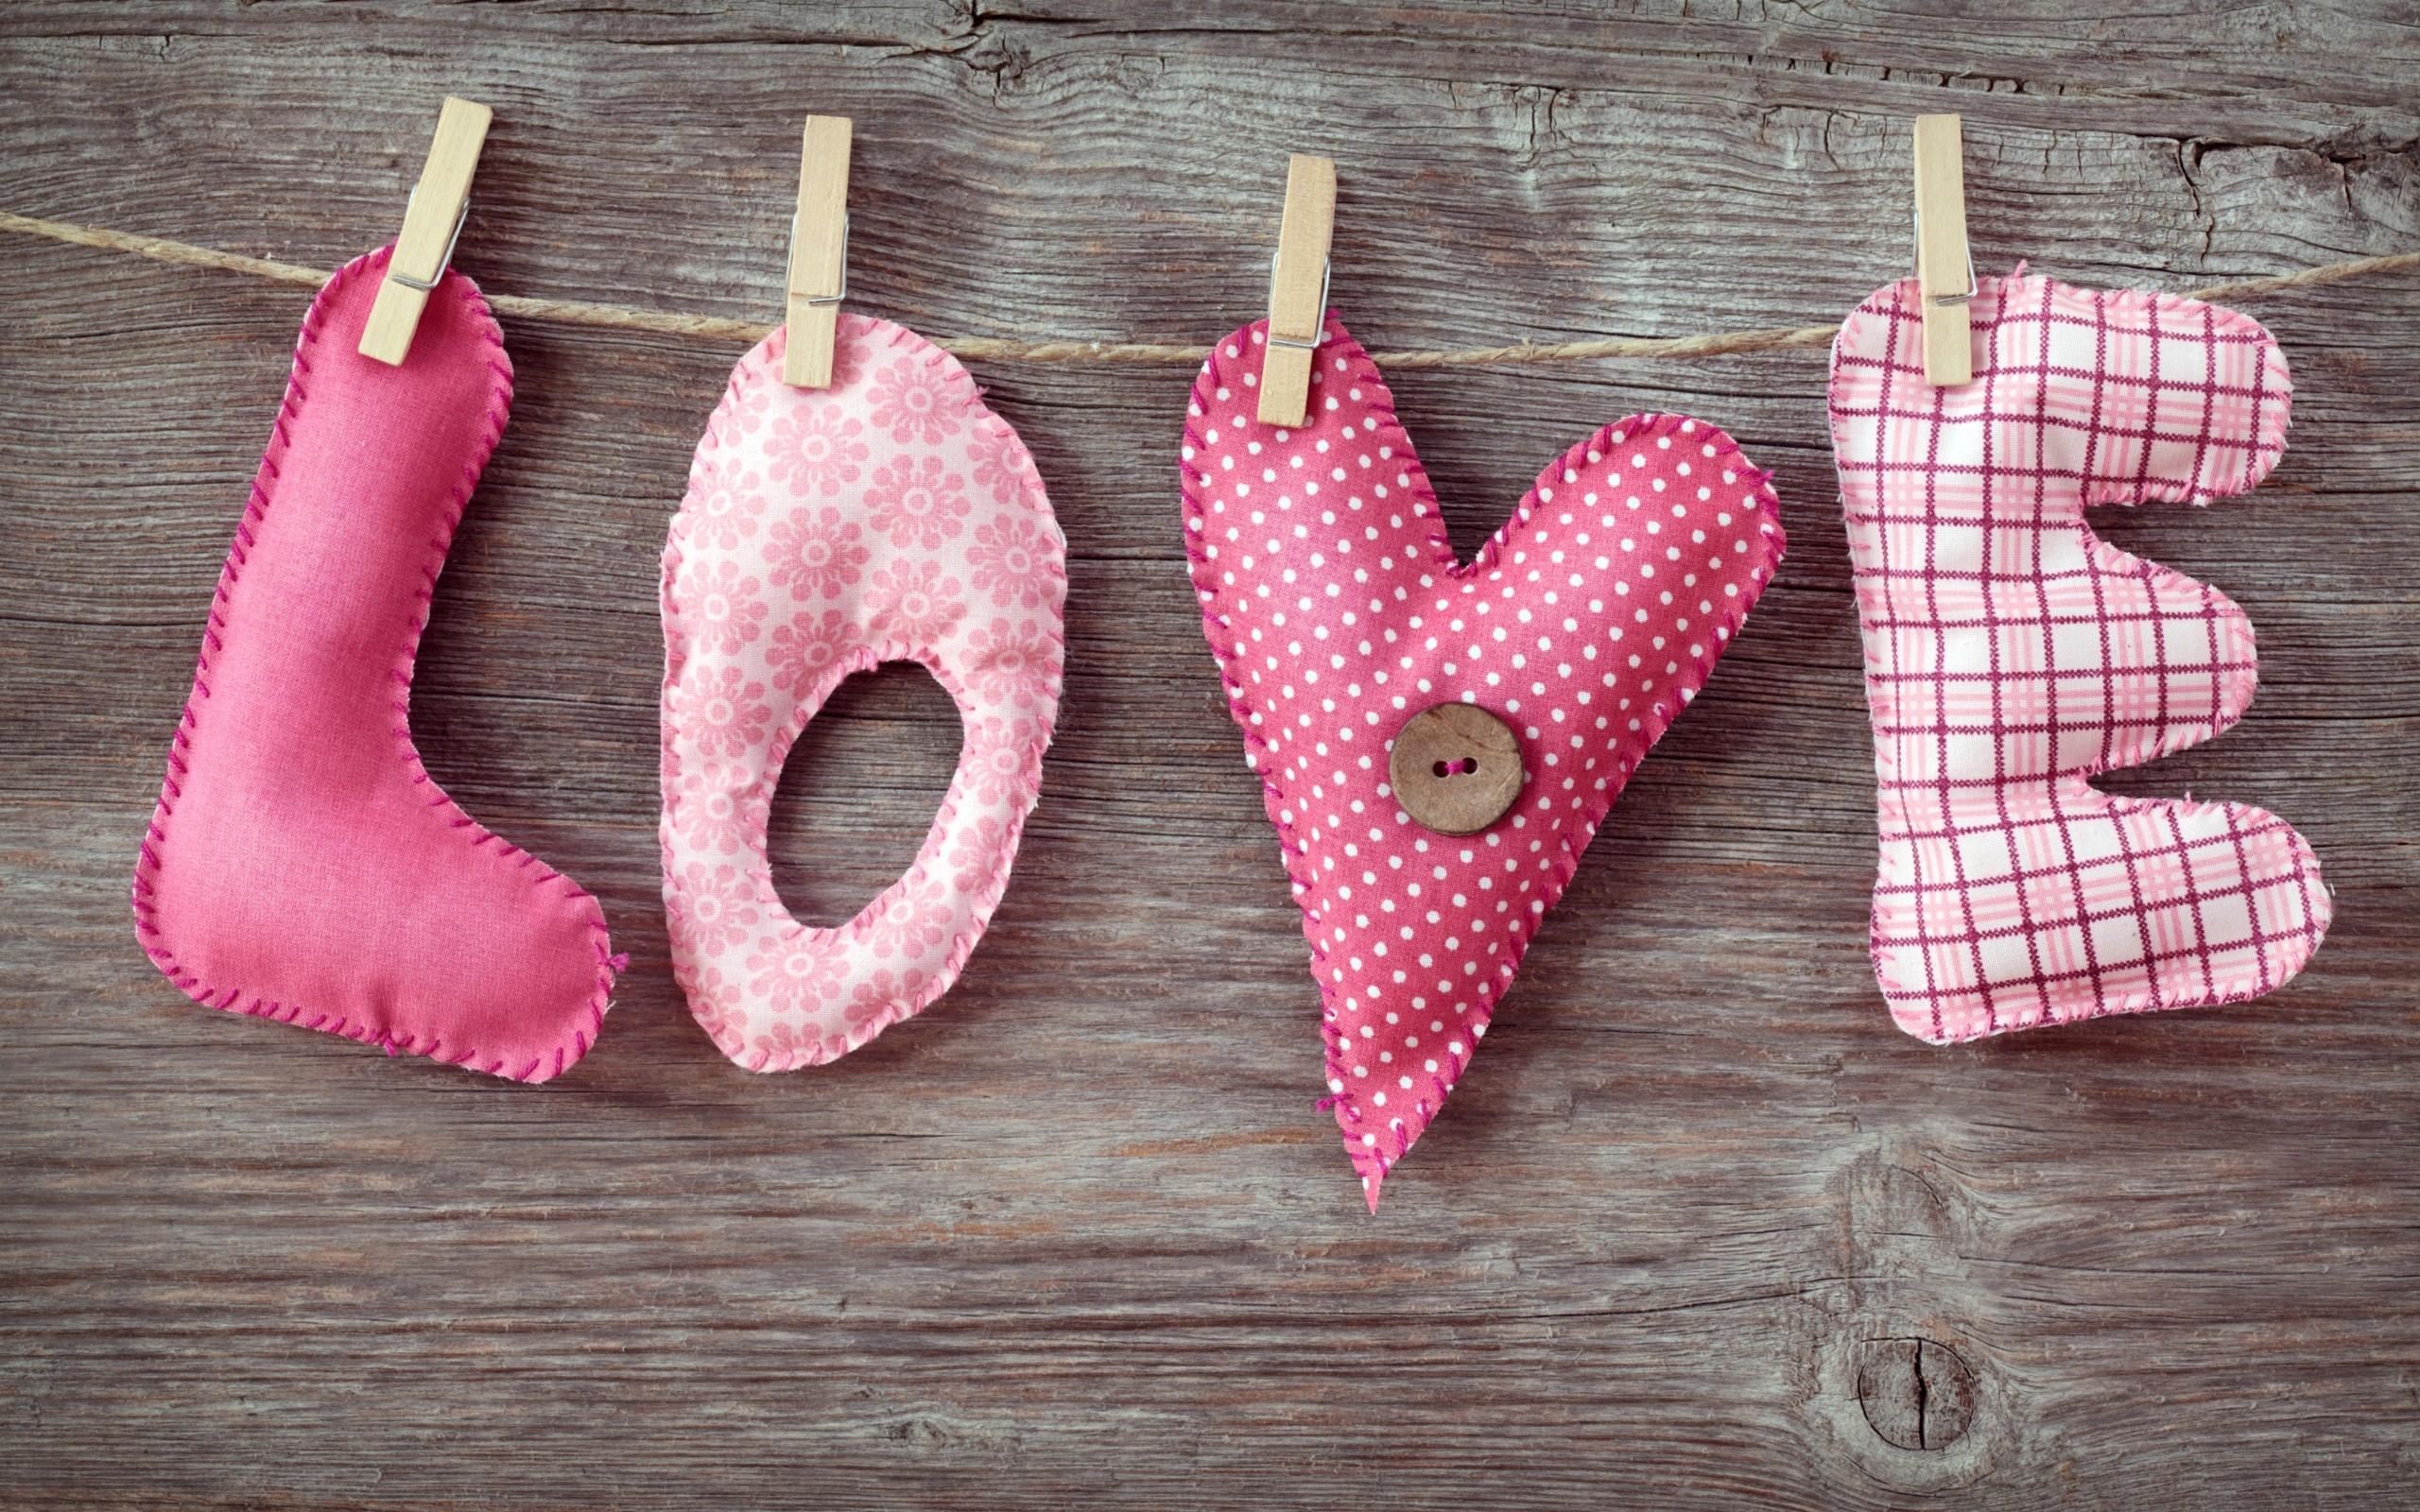 Valentines Day Desktop Wallpaper 65 images 2560x1600